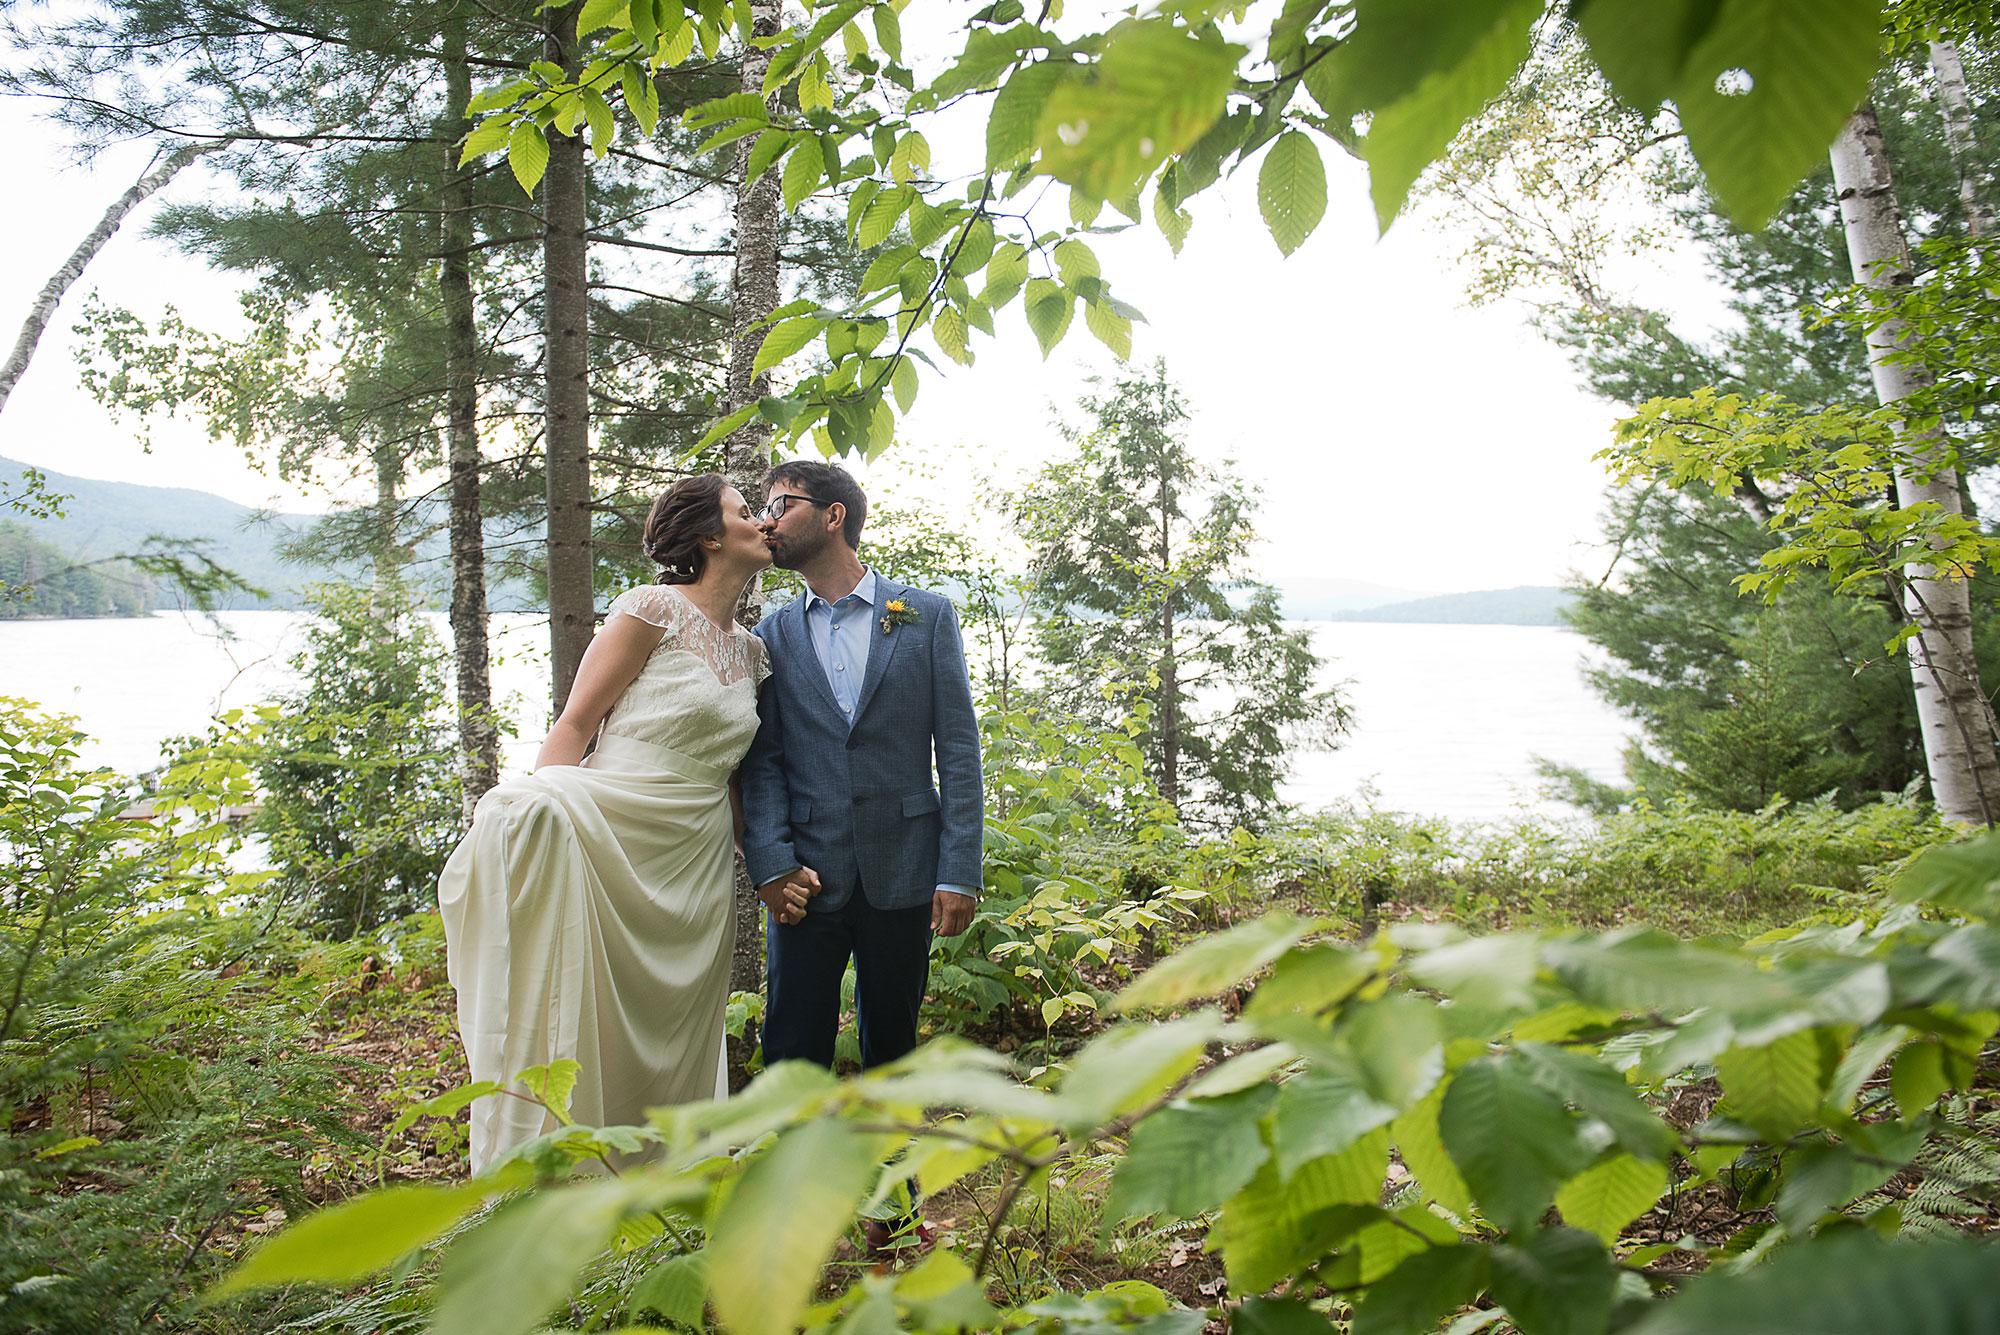 happy_wedding_couple_woodlands.jpg